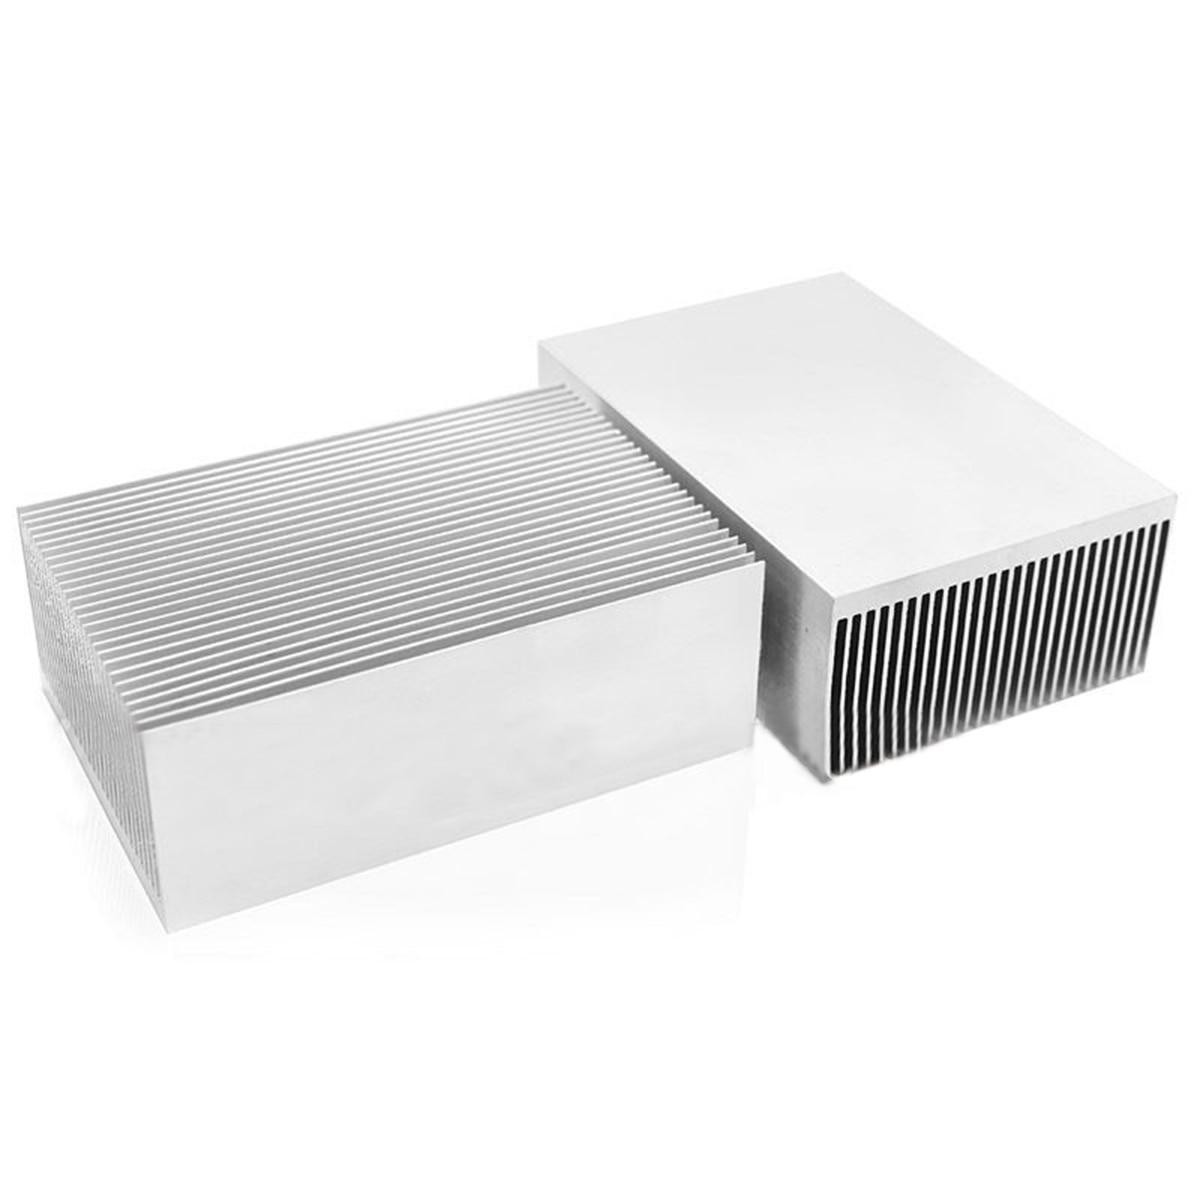 DWZ 1pc Large Big Aluminum Heatsink Heat Sink Radiator for Led High Power Amplifier diy 604 711 radiator heat sink cpu heatsink audio amplifier pure copper thickened base